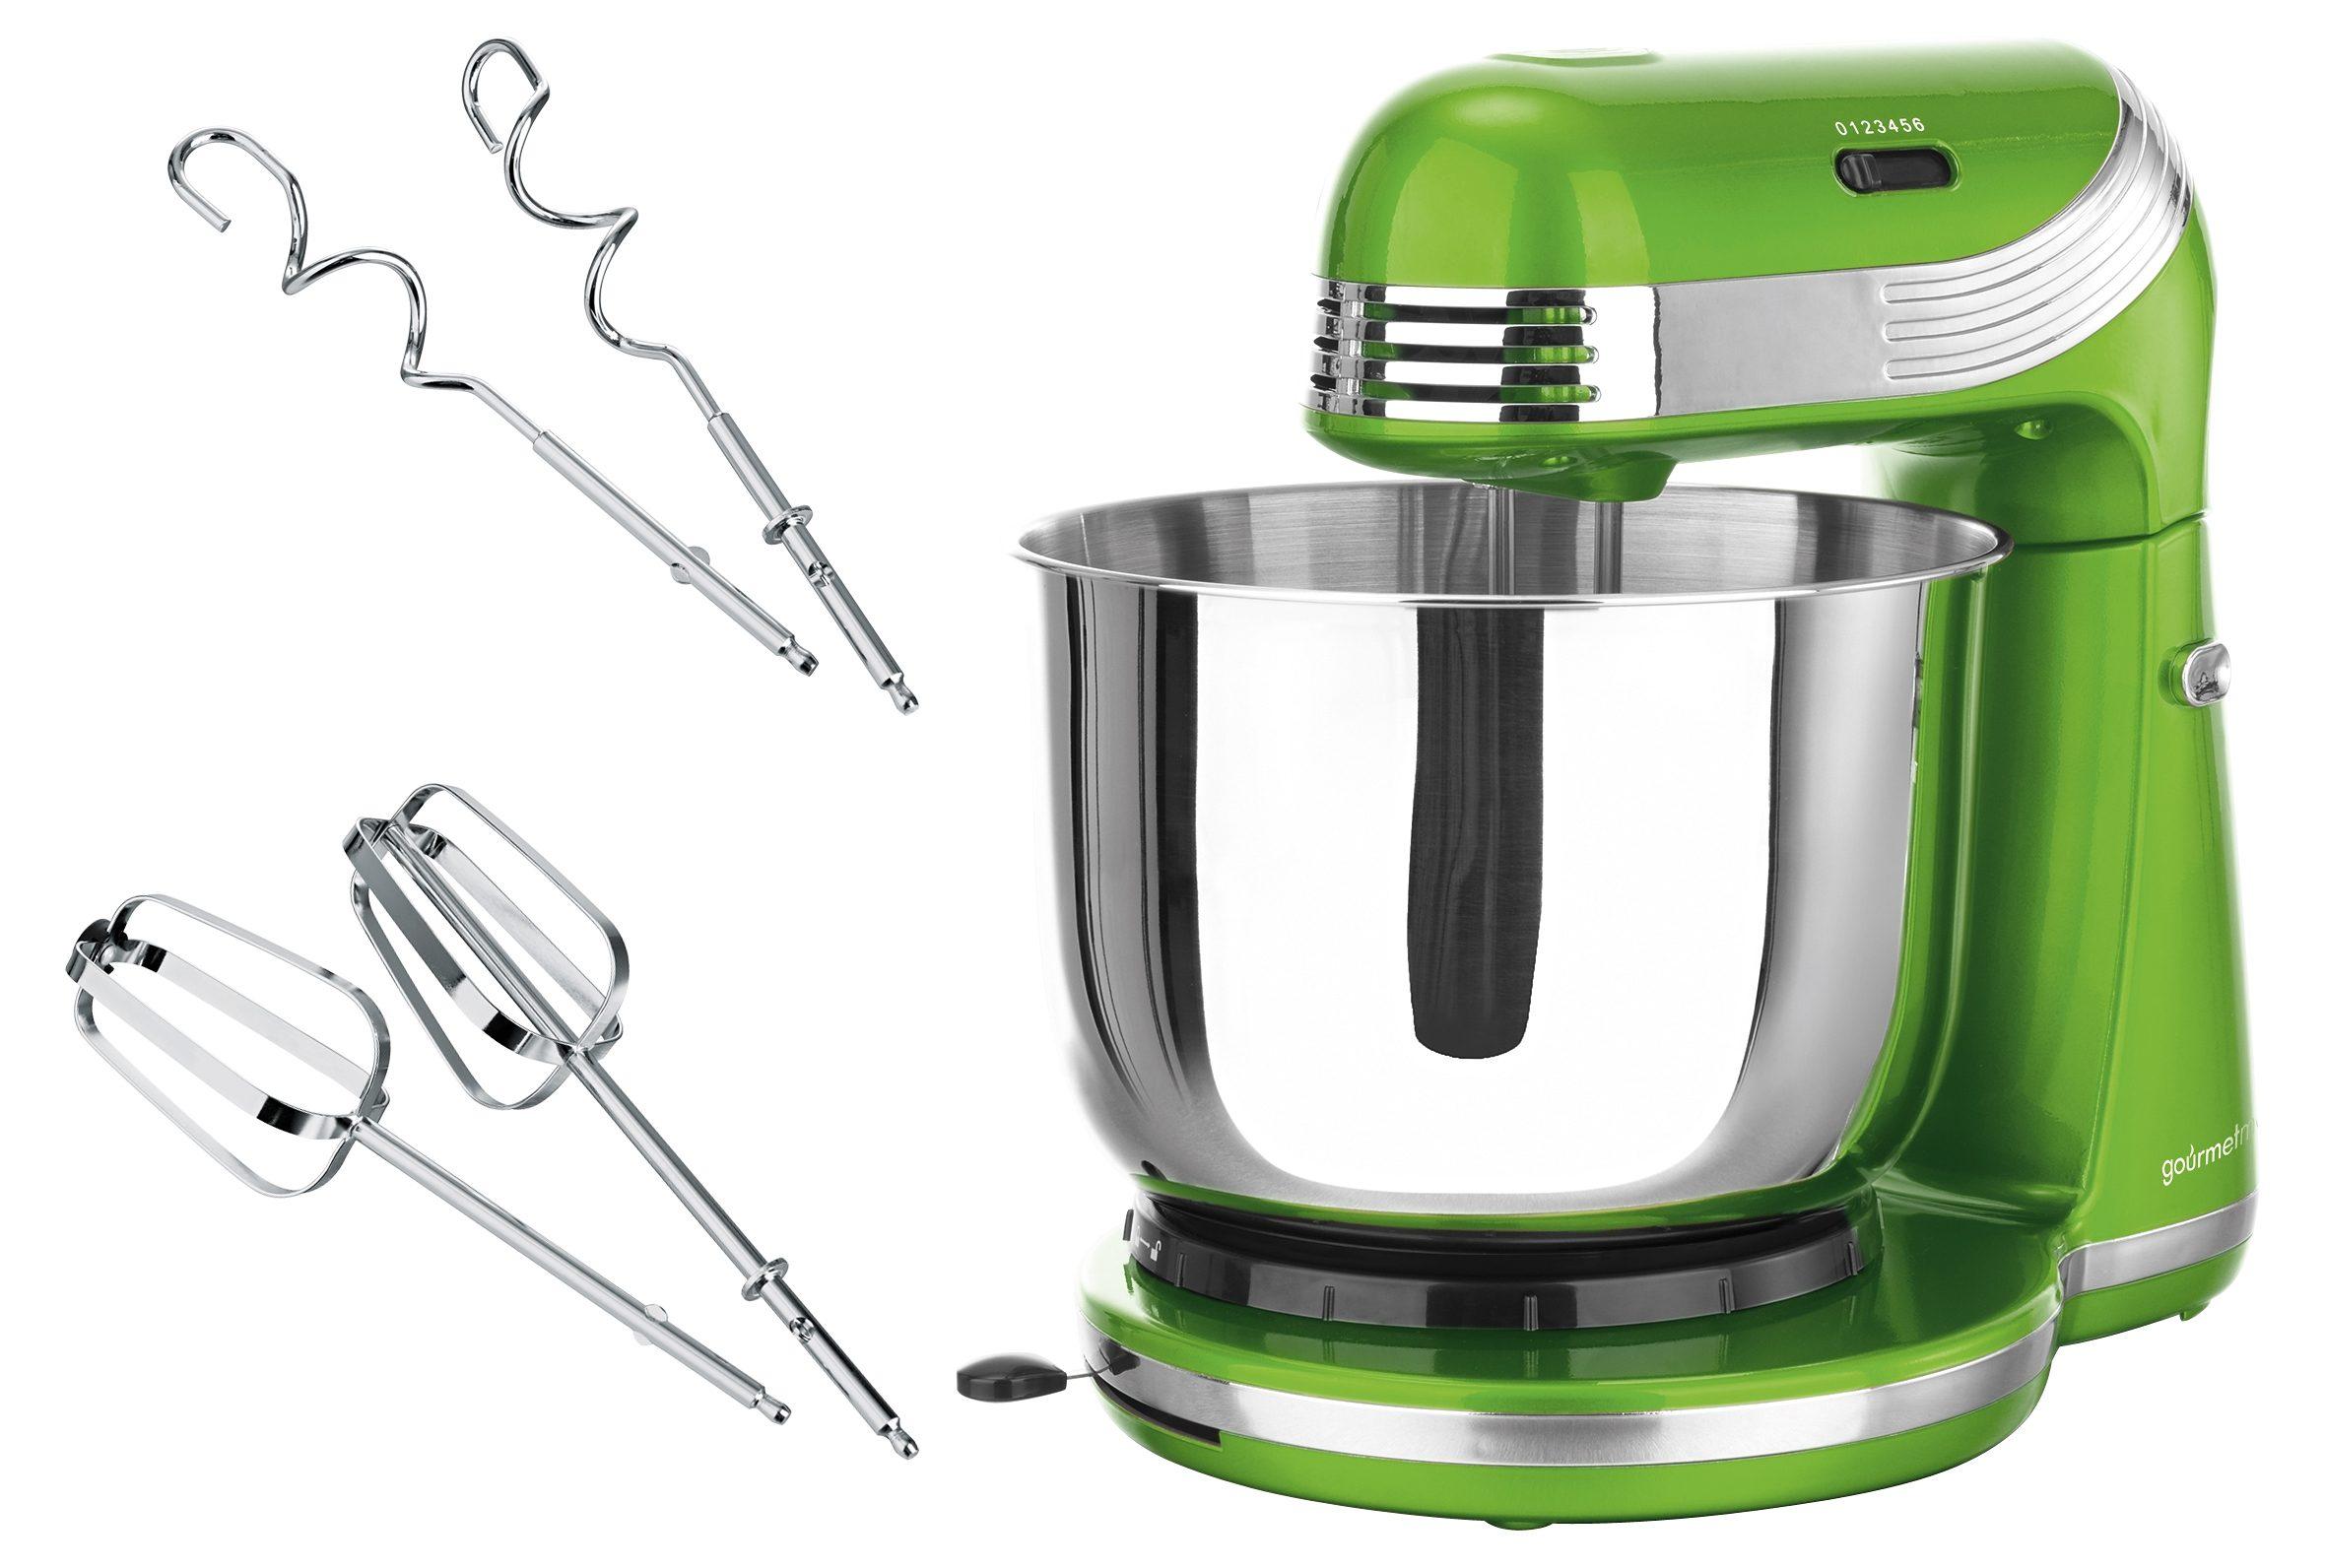 gourmetmaxx Küchenmaschine Classico, 250 Watt